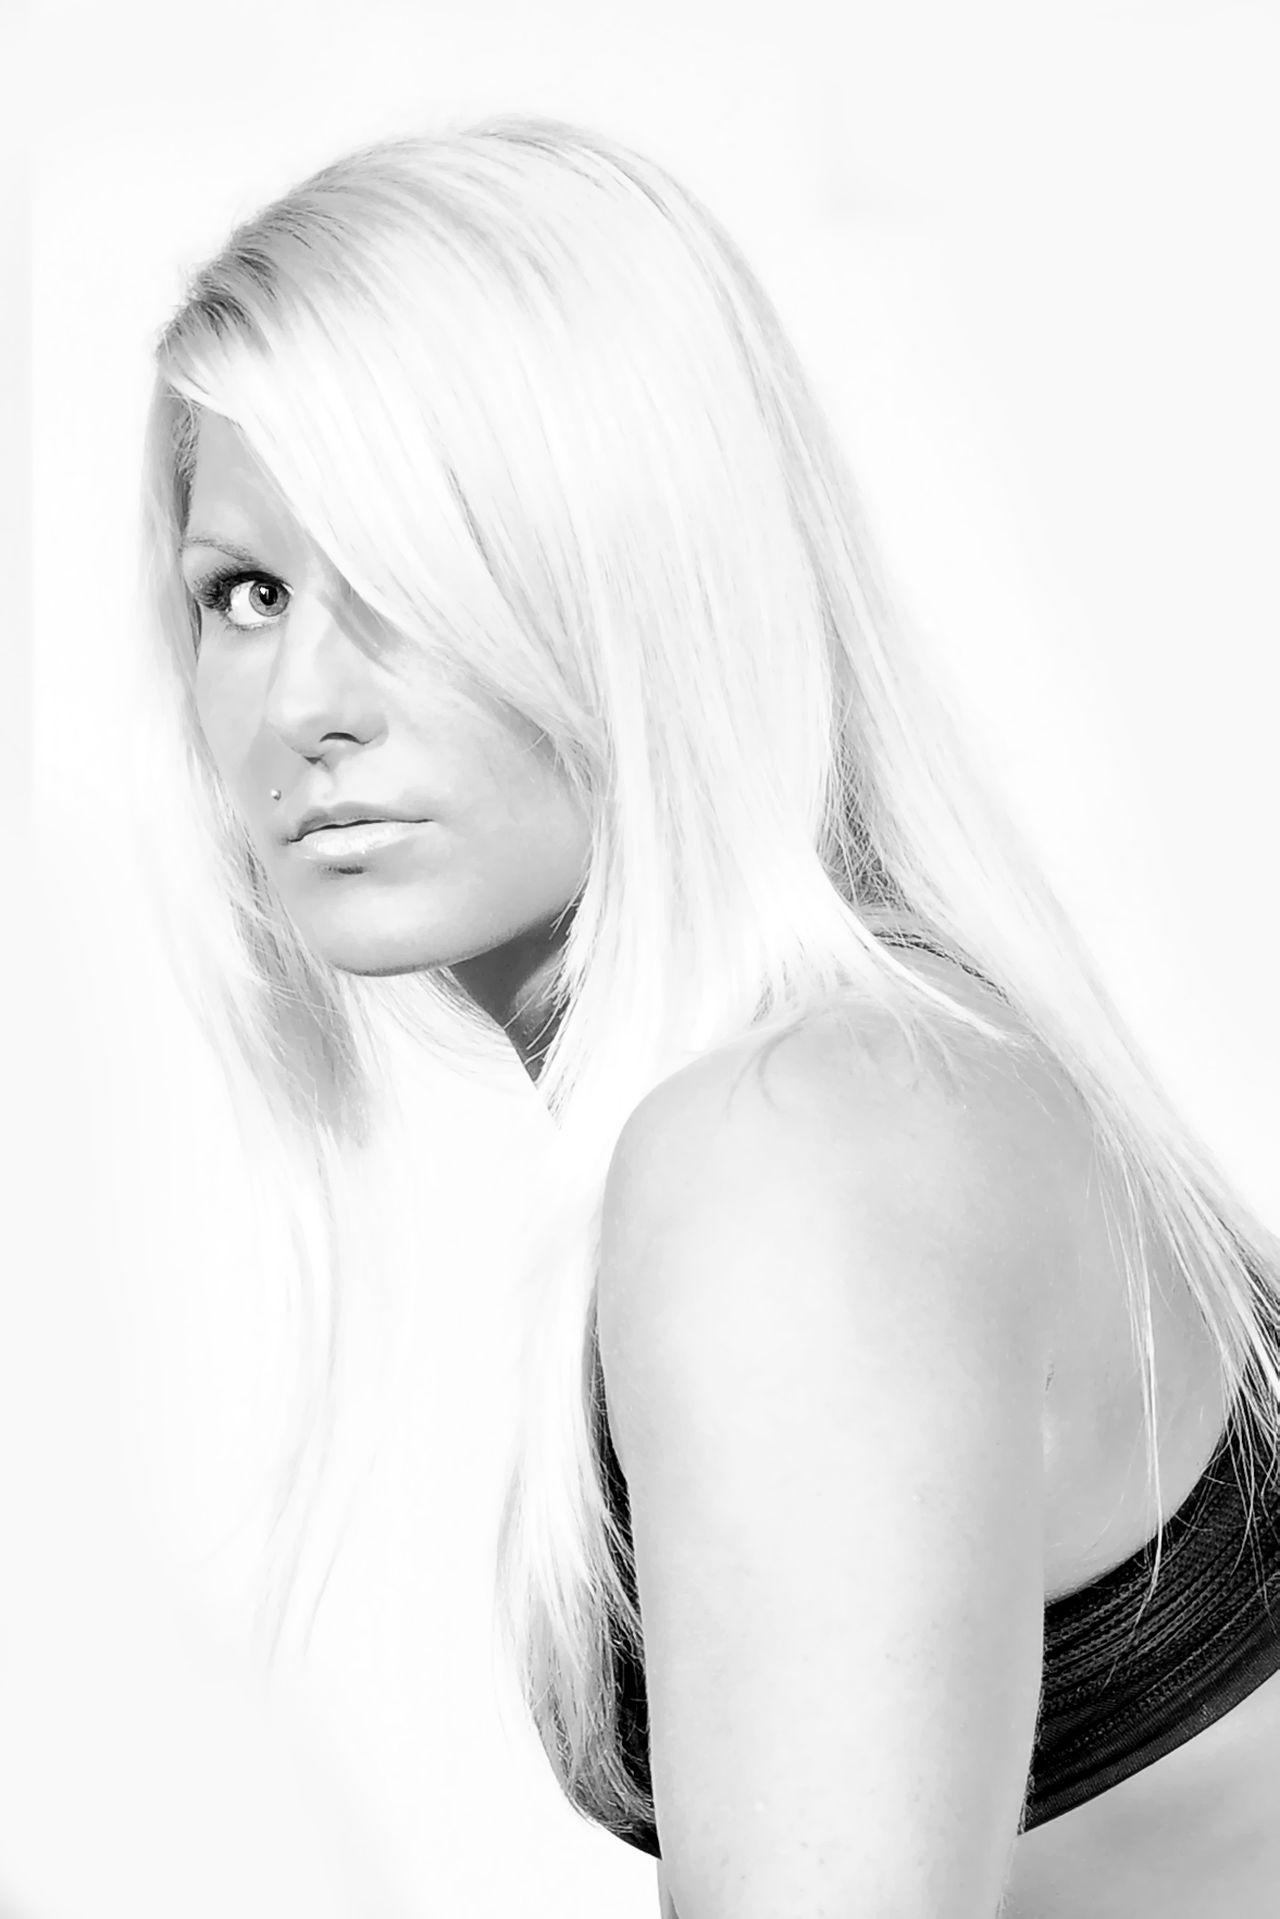 Gr8a Blonde Blackandwhite Eyes Portrait Portraitmaffia Pécs Ingym The Portraitist - 2016 EyeEm Awards